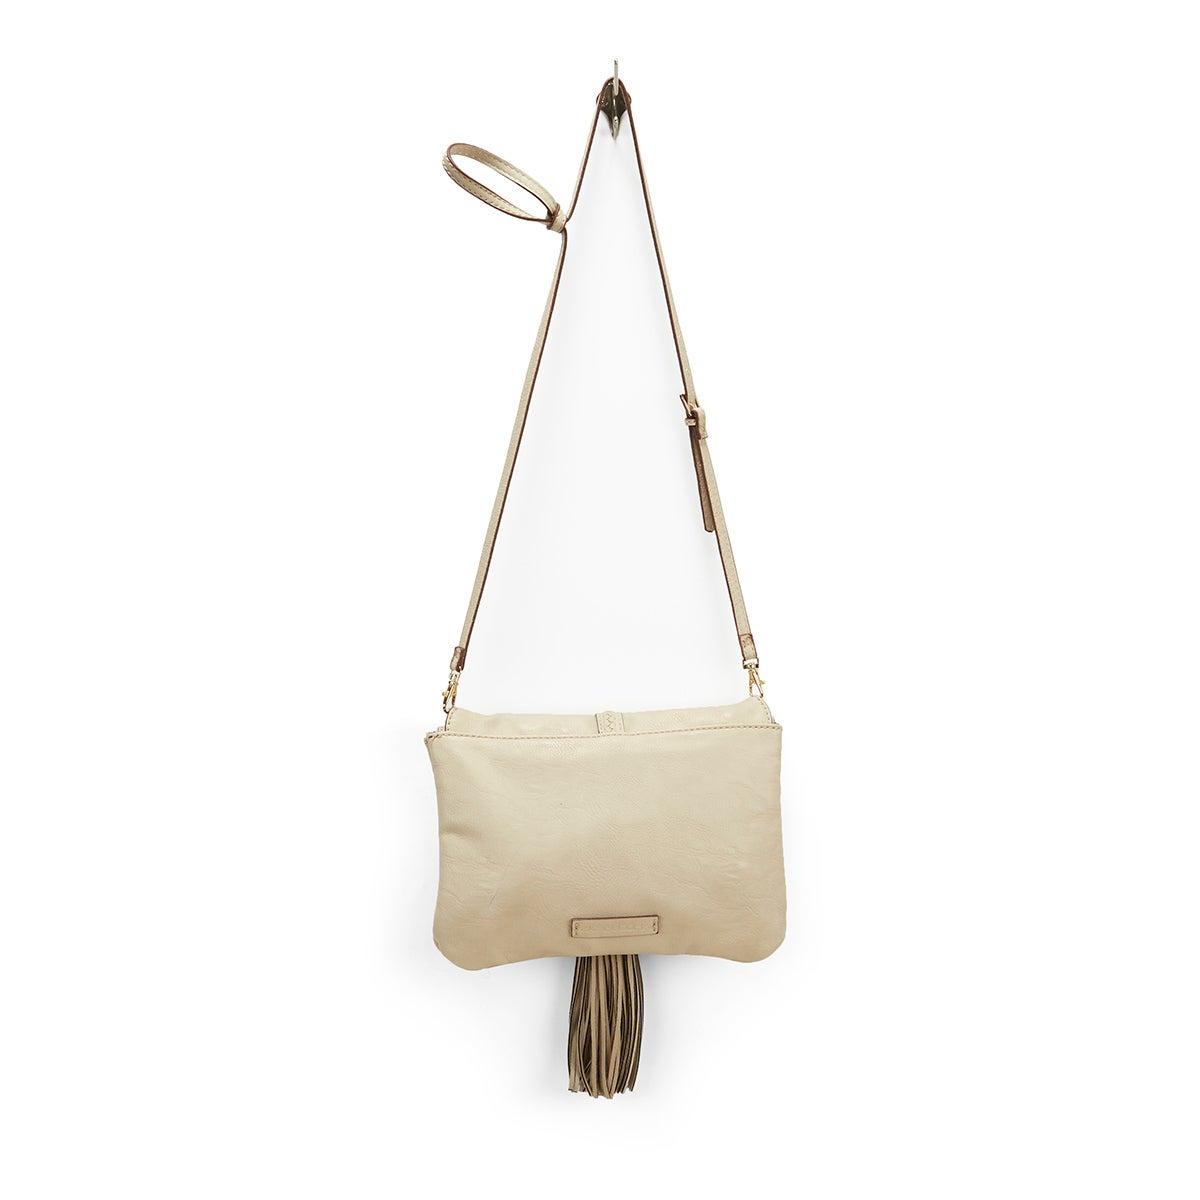 Lds JBaylee stone tassel cross body bag